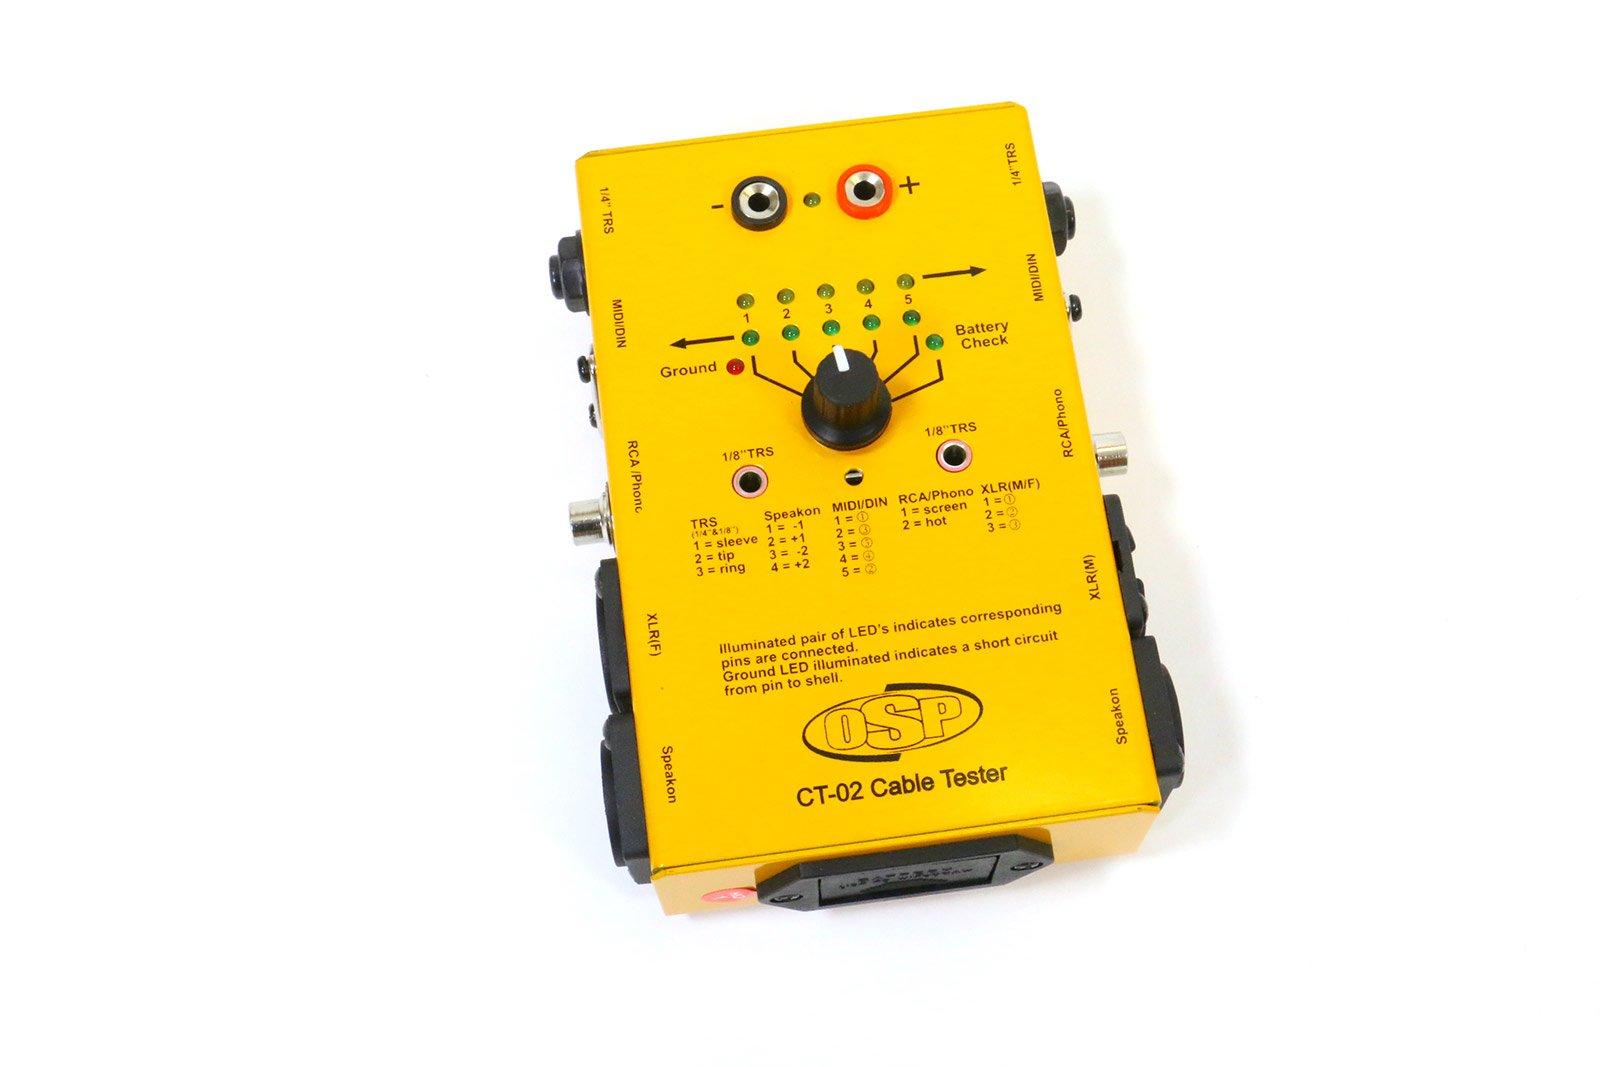 OSP CT-02 Cable Tester XLR, 1/4'' TRS, Speakon, RCA, MIDI/DIN